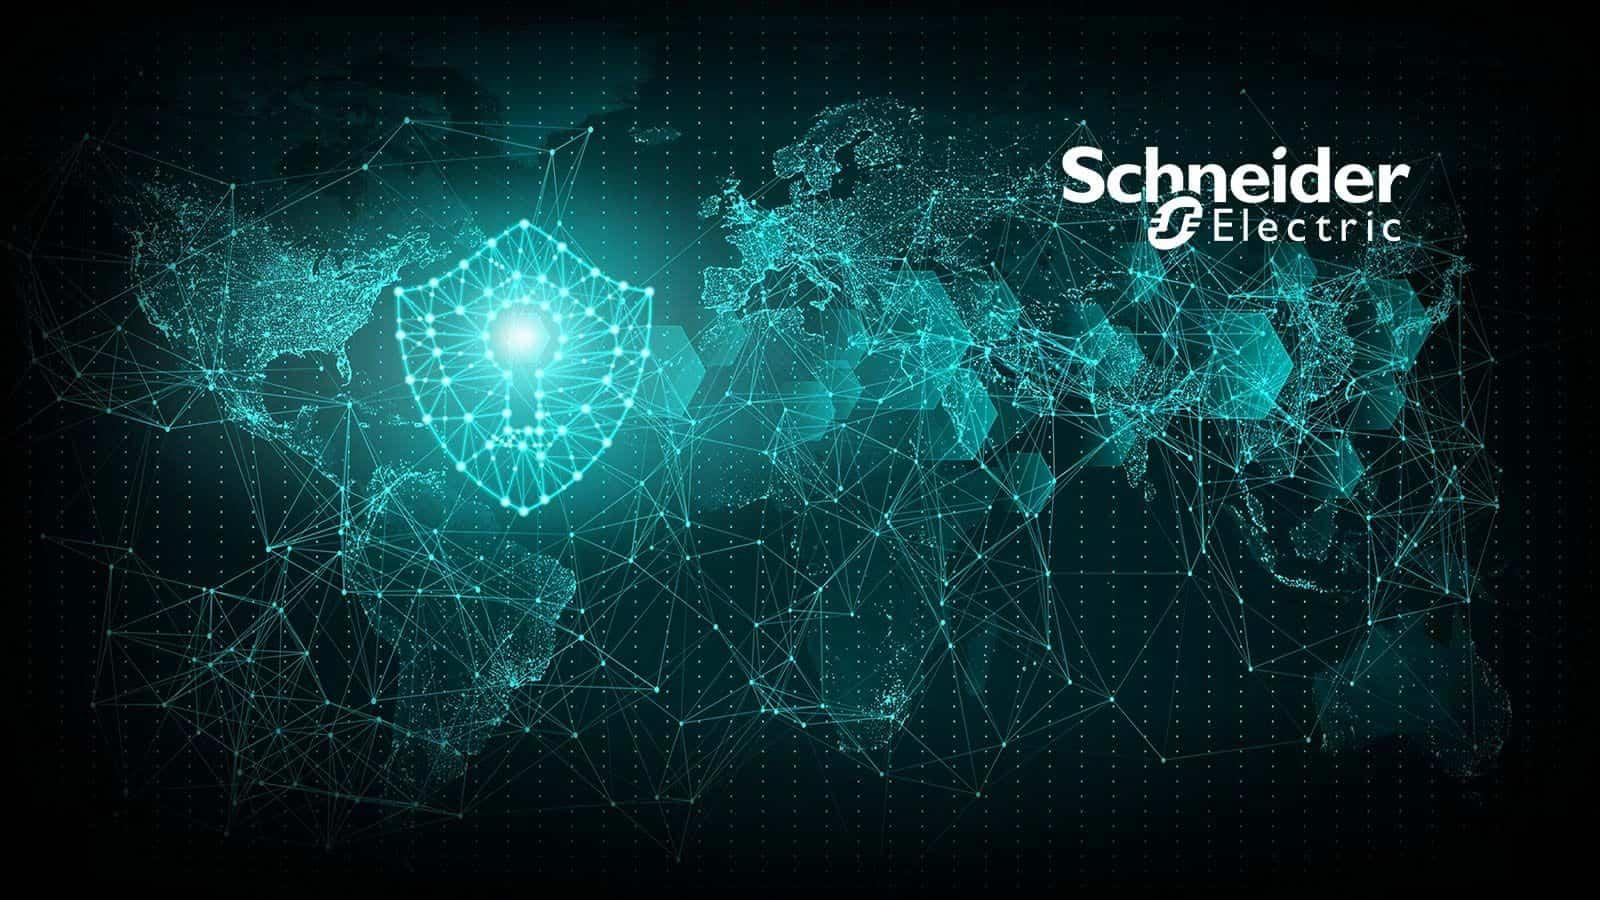 schneider electric se une al cybersecurity tech accord